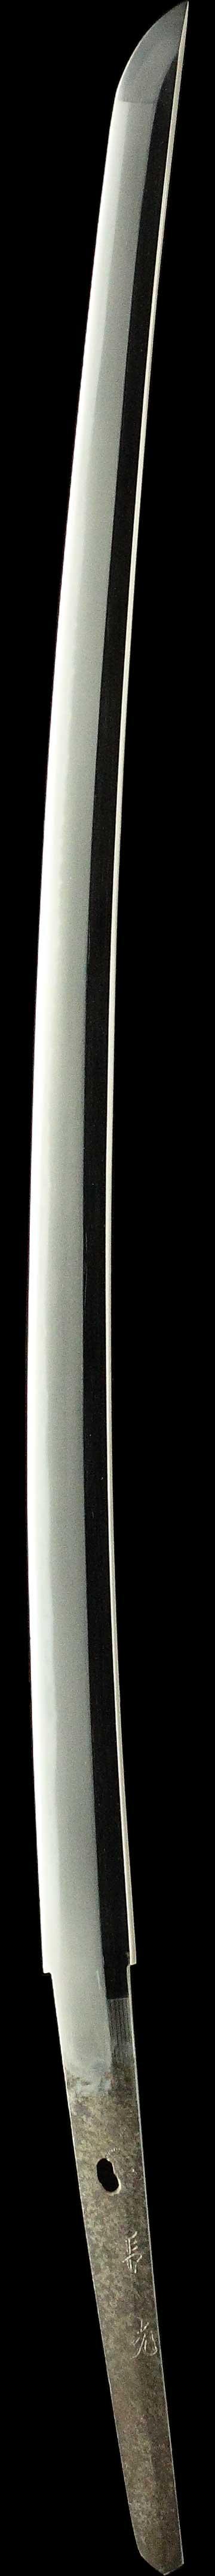 長光の刀身縦表全景